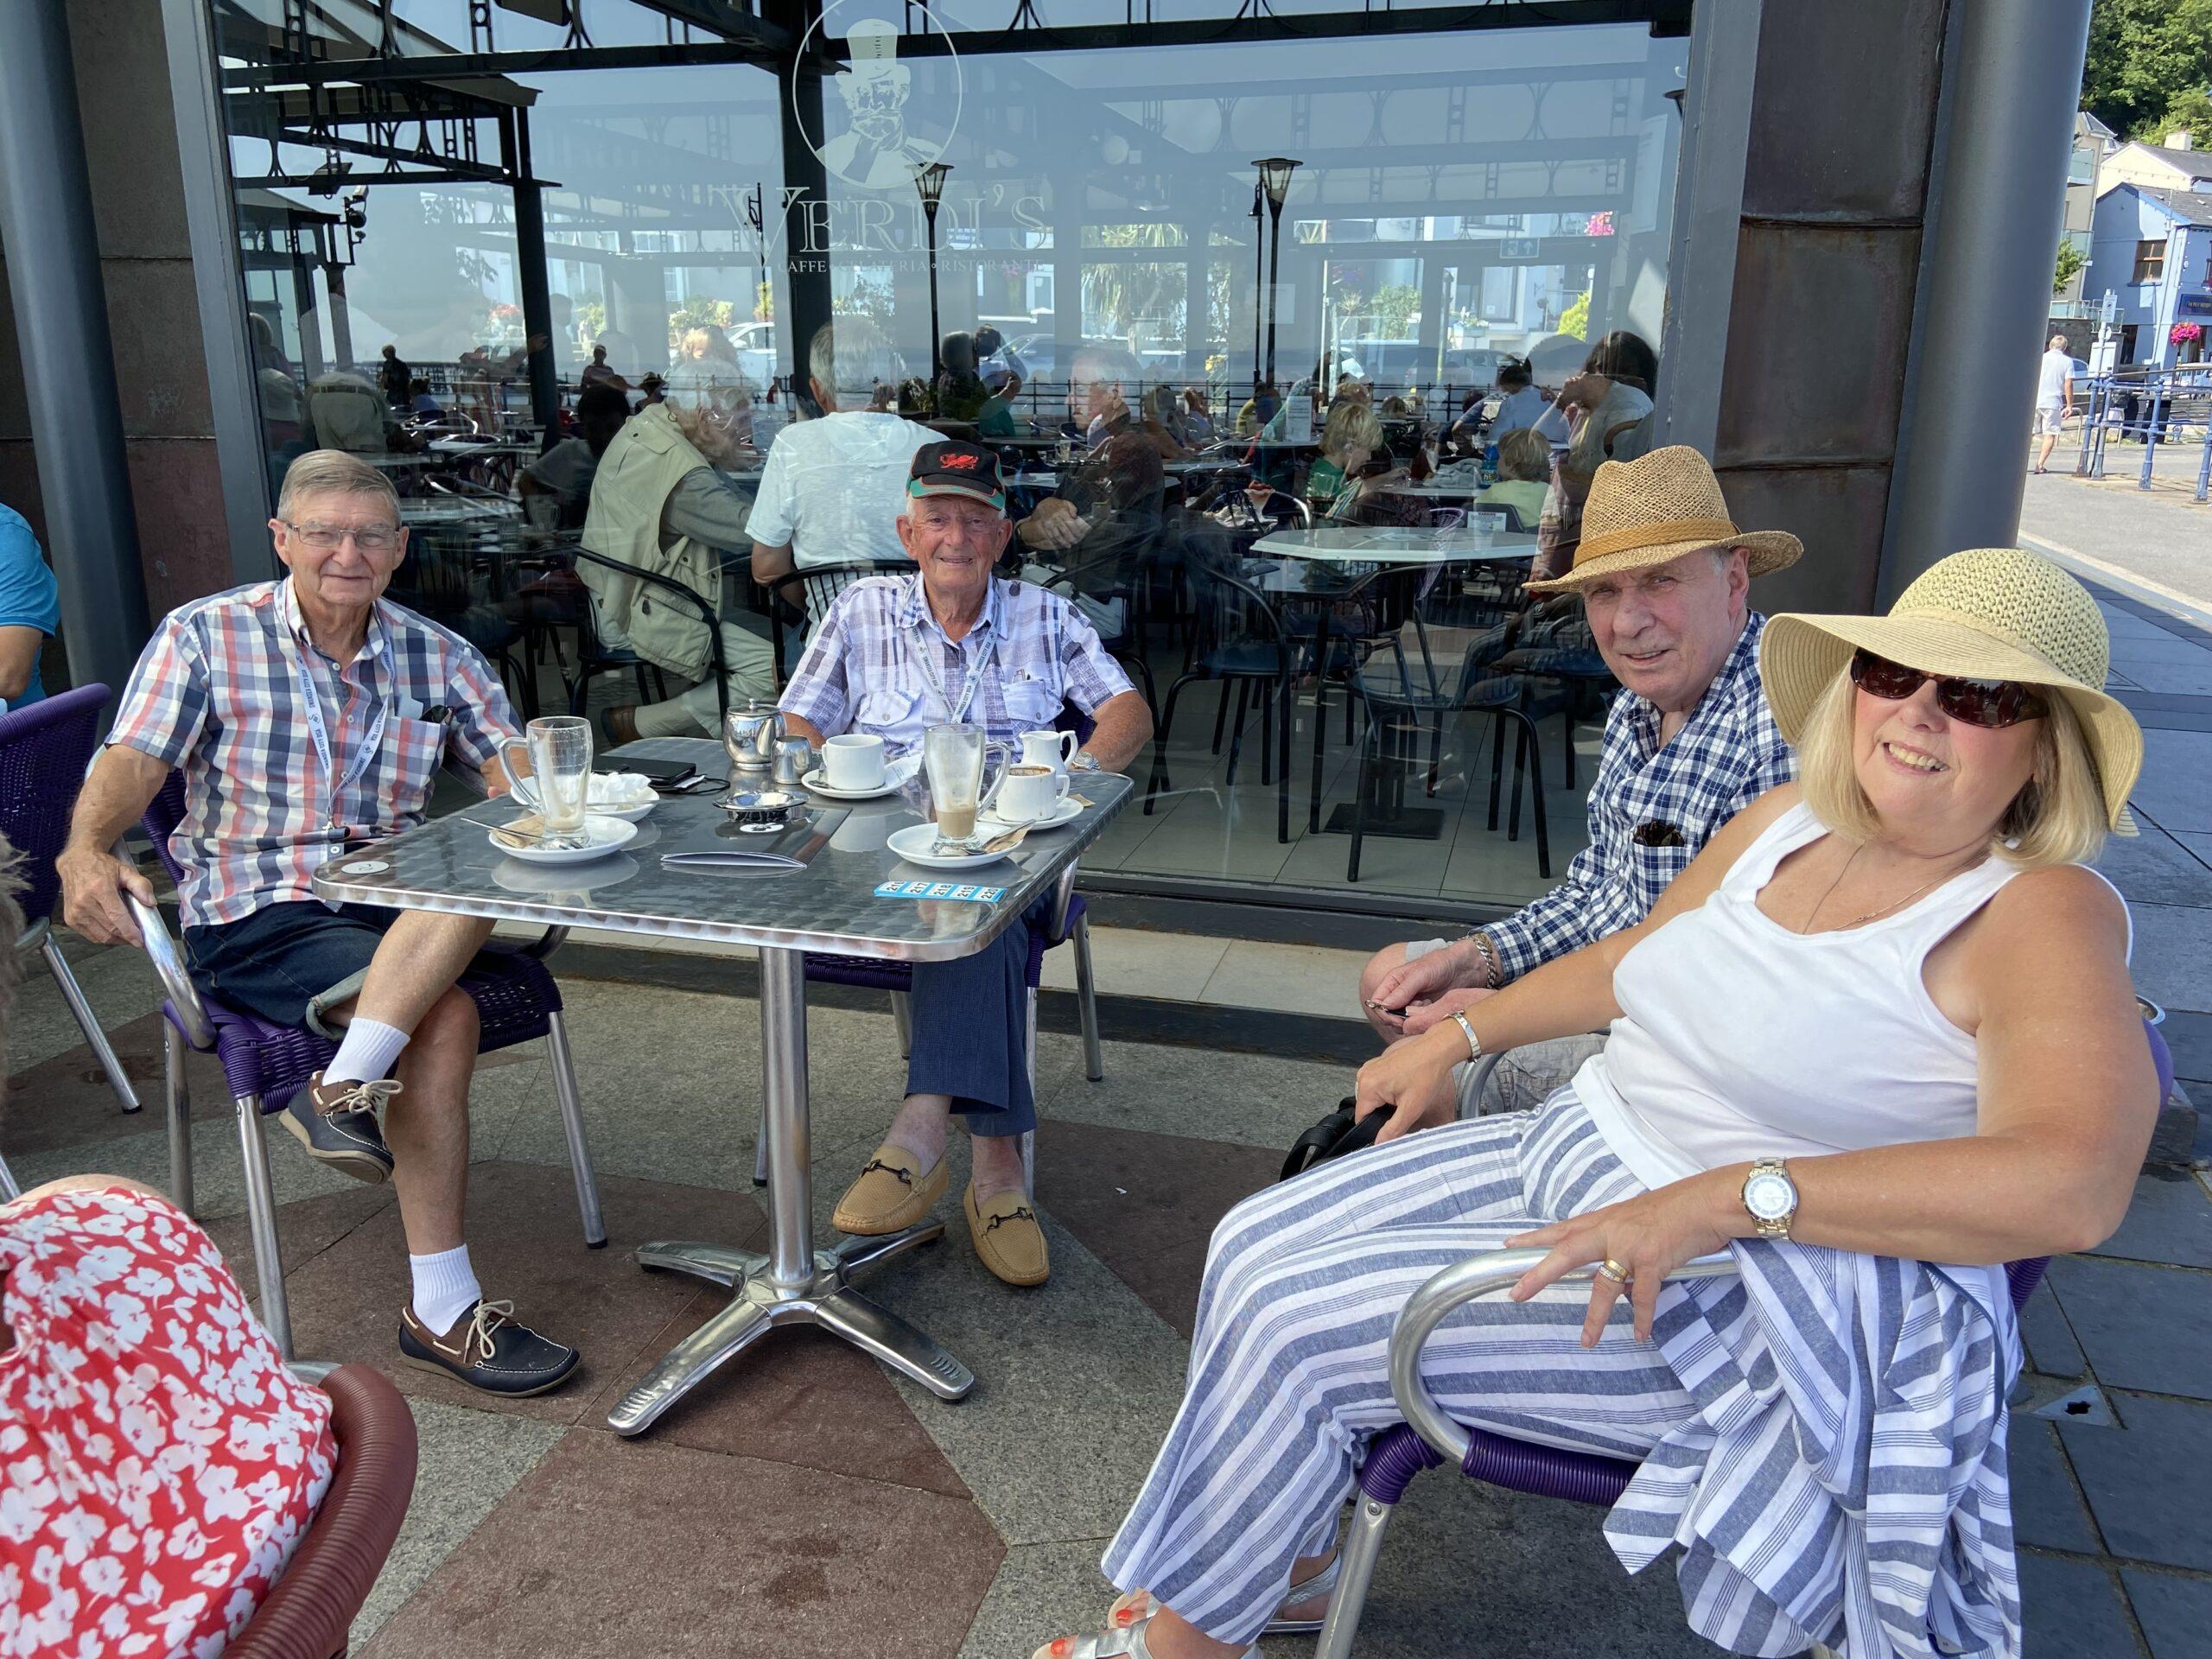 Verdi's Coffee Morning - July 2021